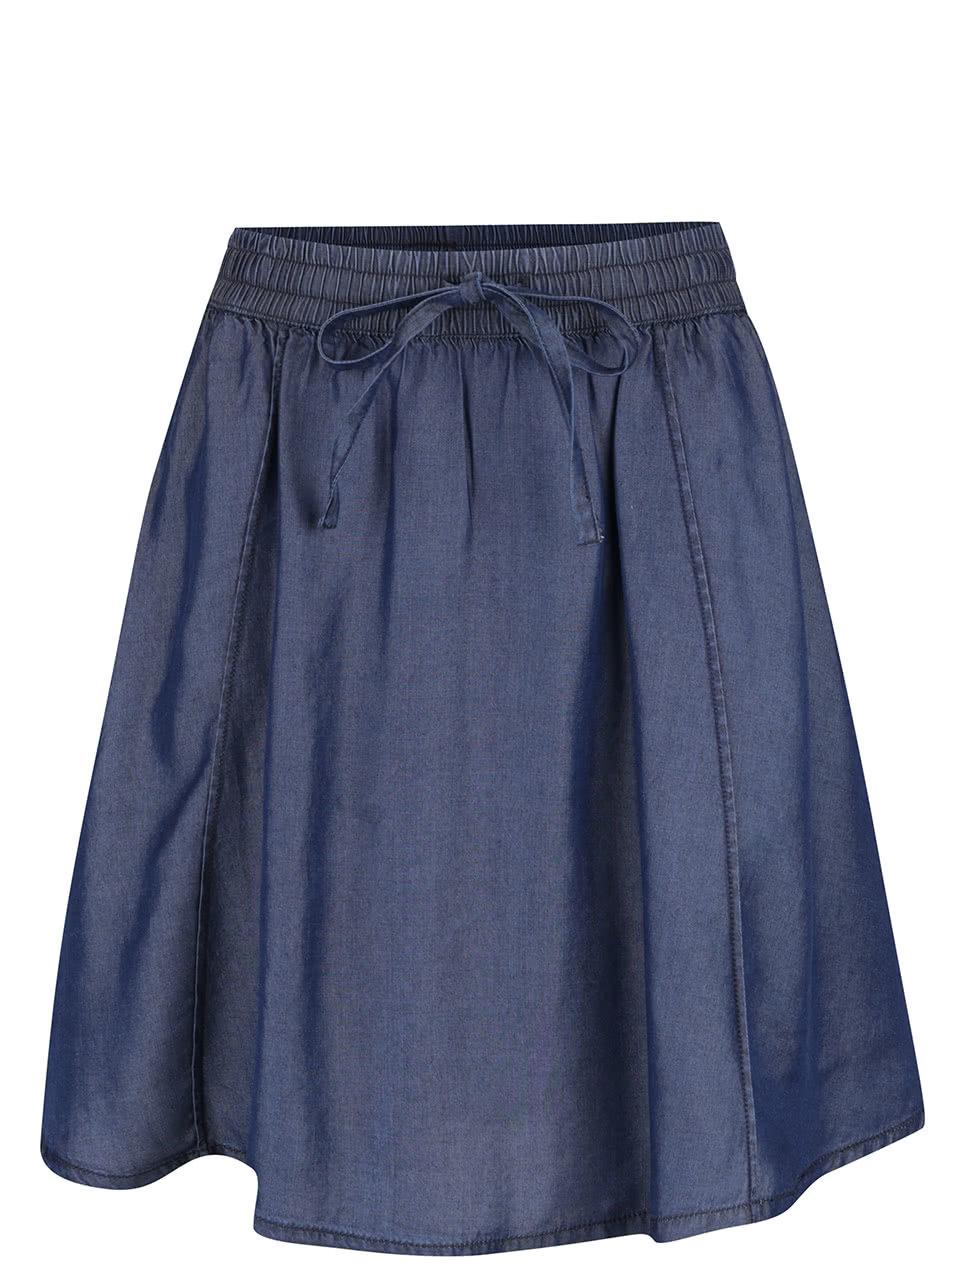 fda7d690d1f Tmavě modrá sukně s kapsami VILA Sinea ...